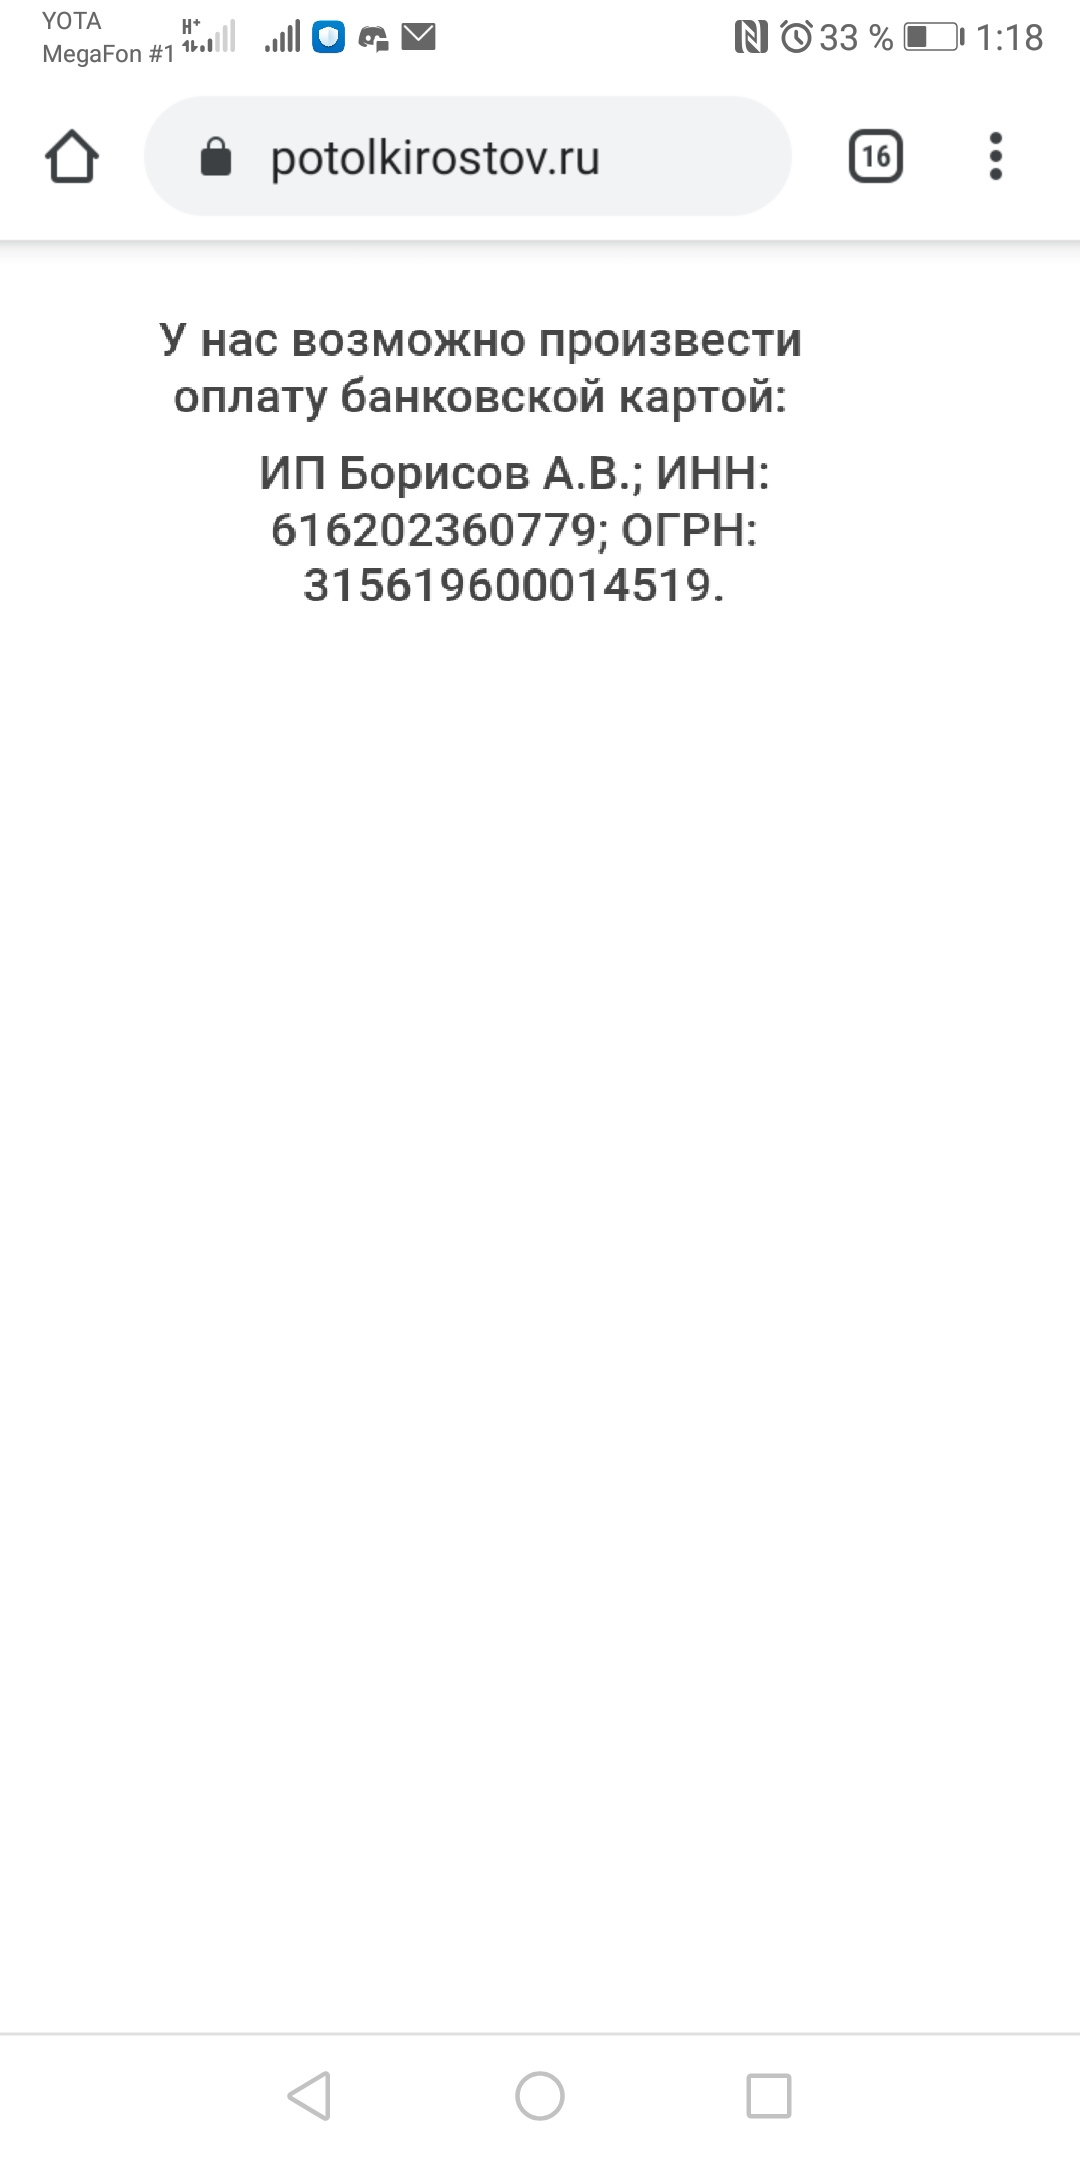 5efd0cae3fc60495501140.jpeg